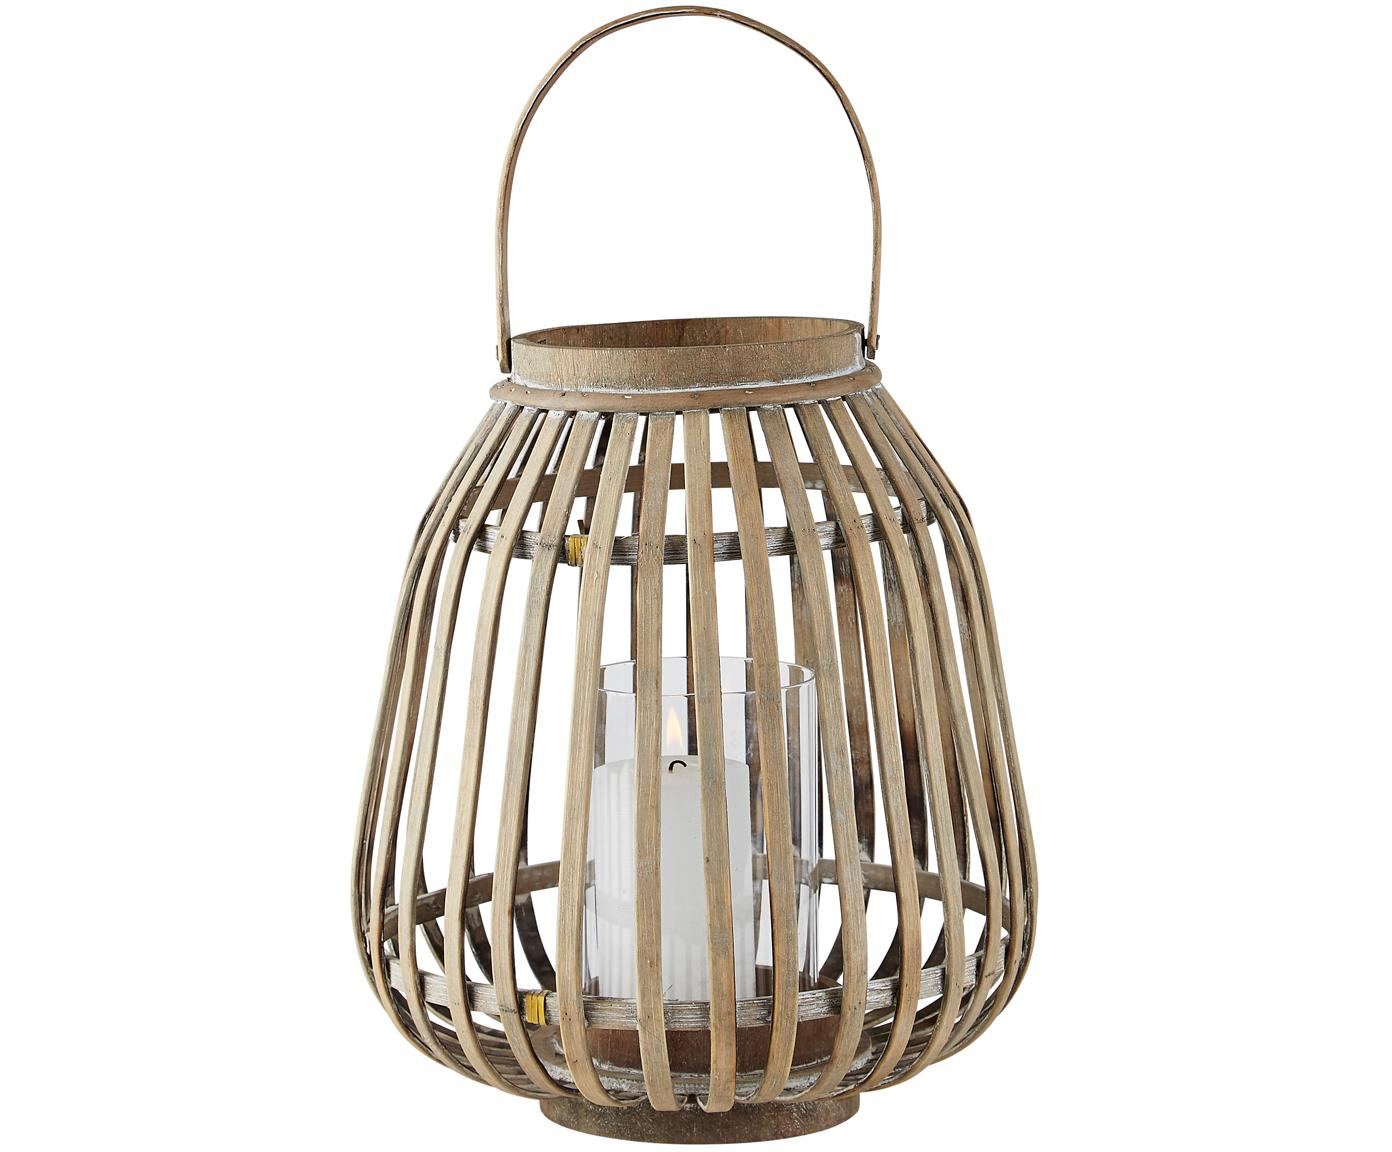 Laterne Alma, Gestell: Bambus, Windlicht: Glas, Gestell: Bambus<br>Windlicht: Transparent, Ø 25 x H 30 cm